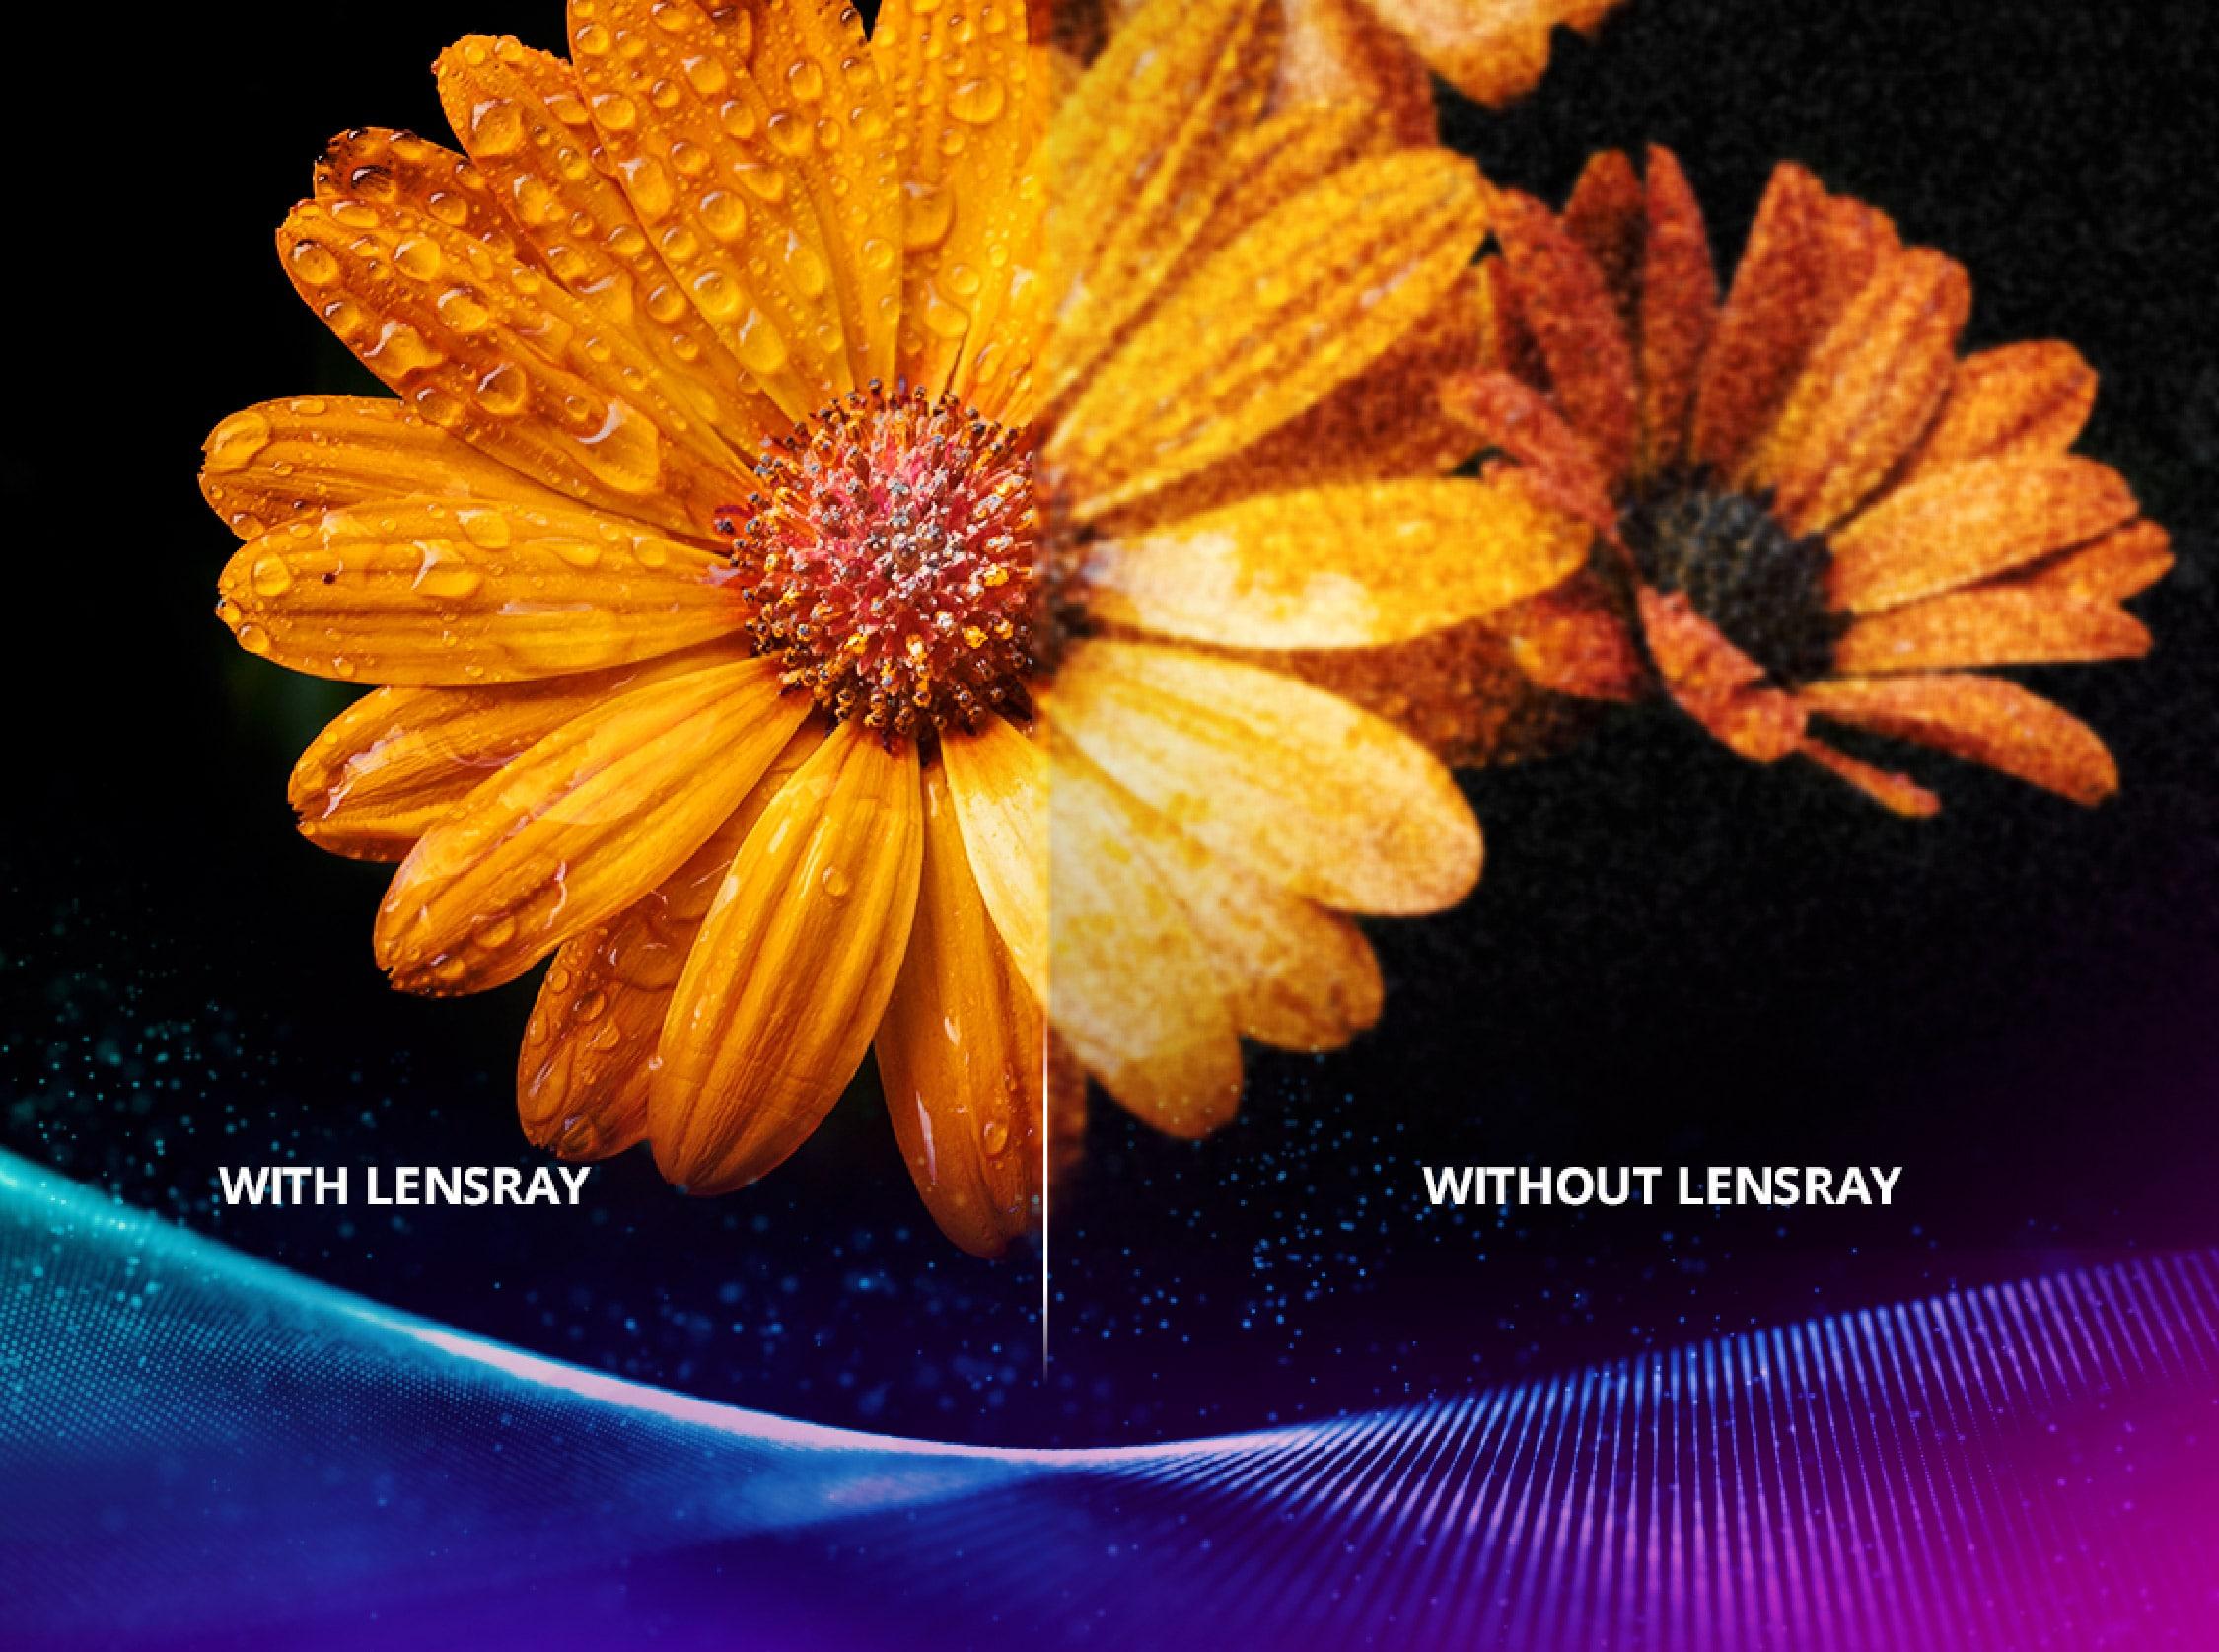 Lensray Technology